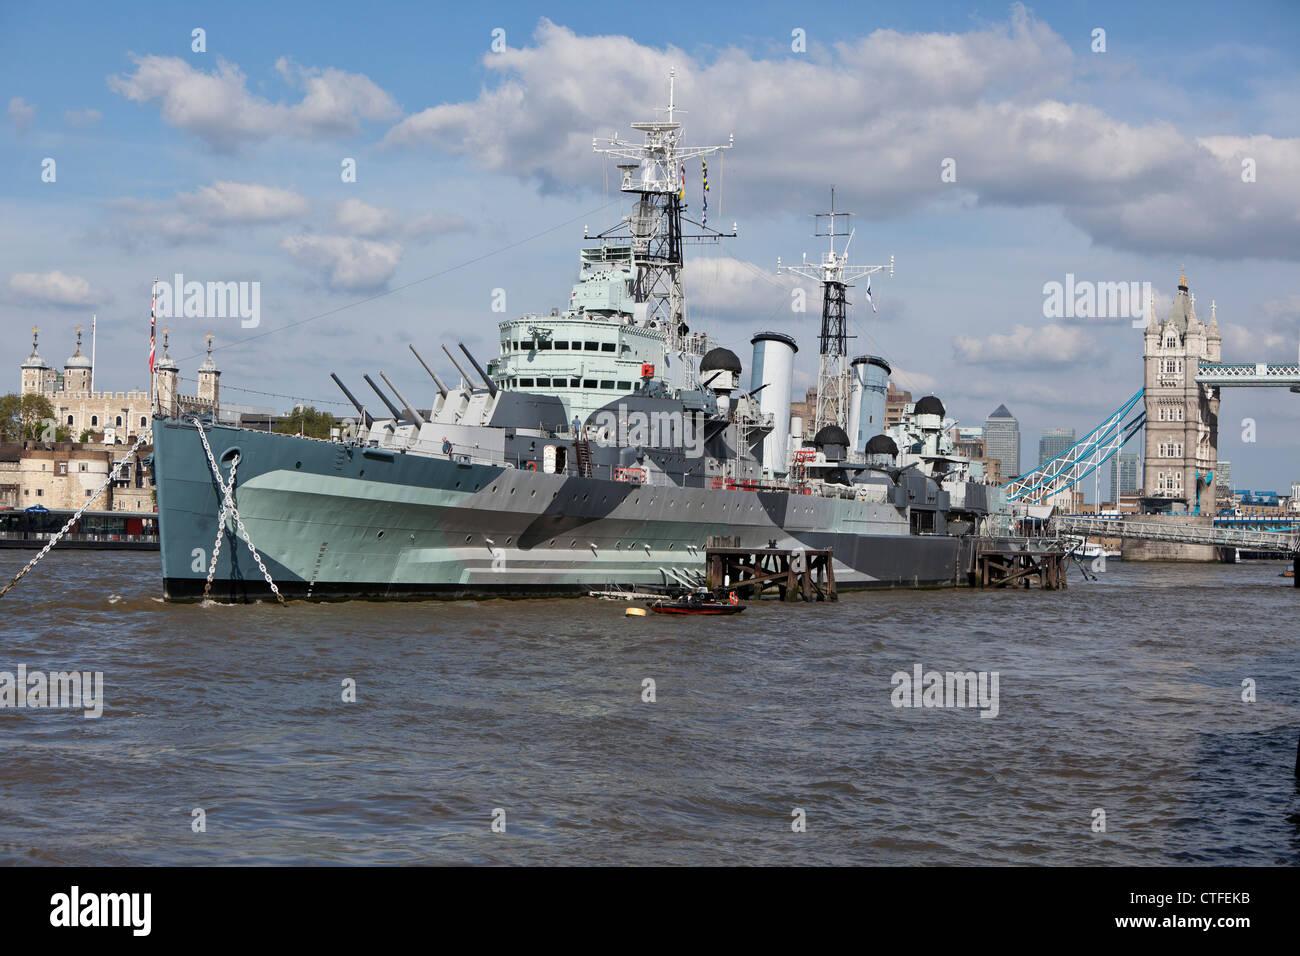 HMS Belfast (C35) museum ship, Southwark, London, England, UK - Stock Image